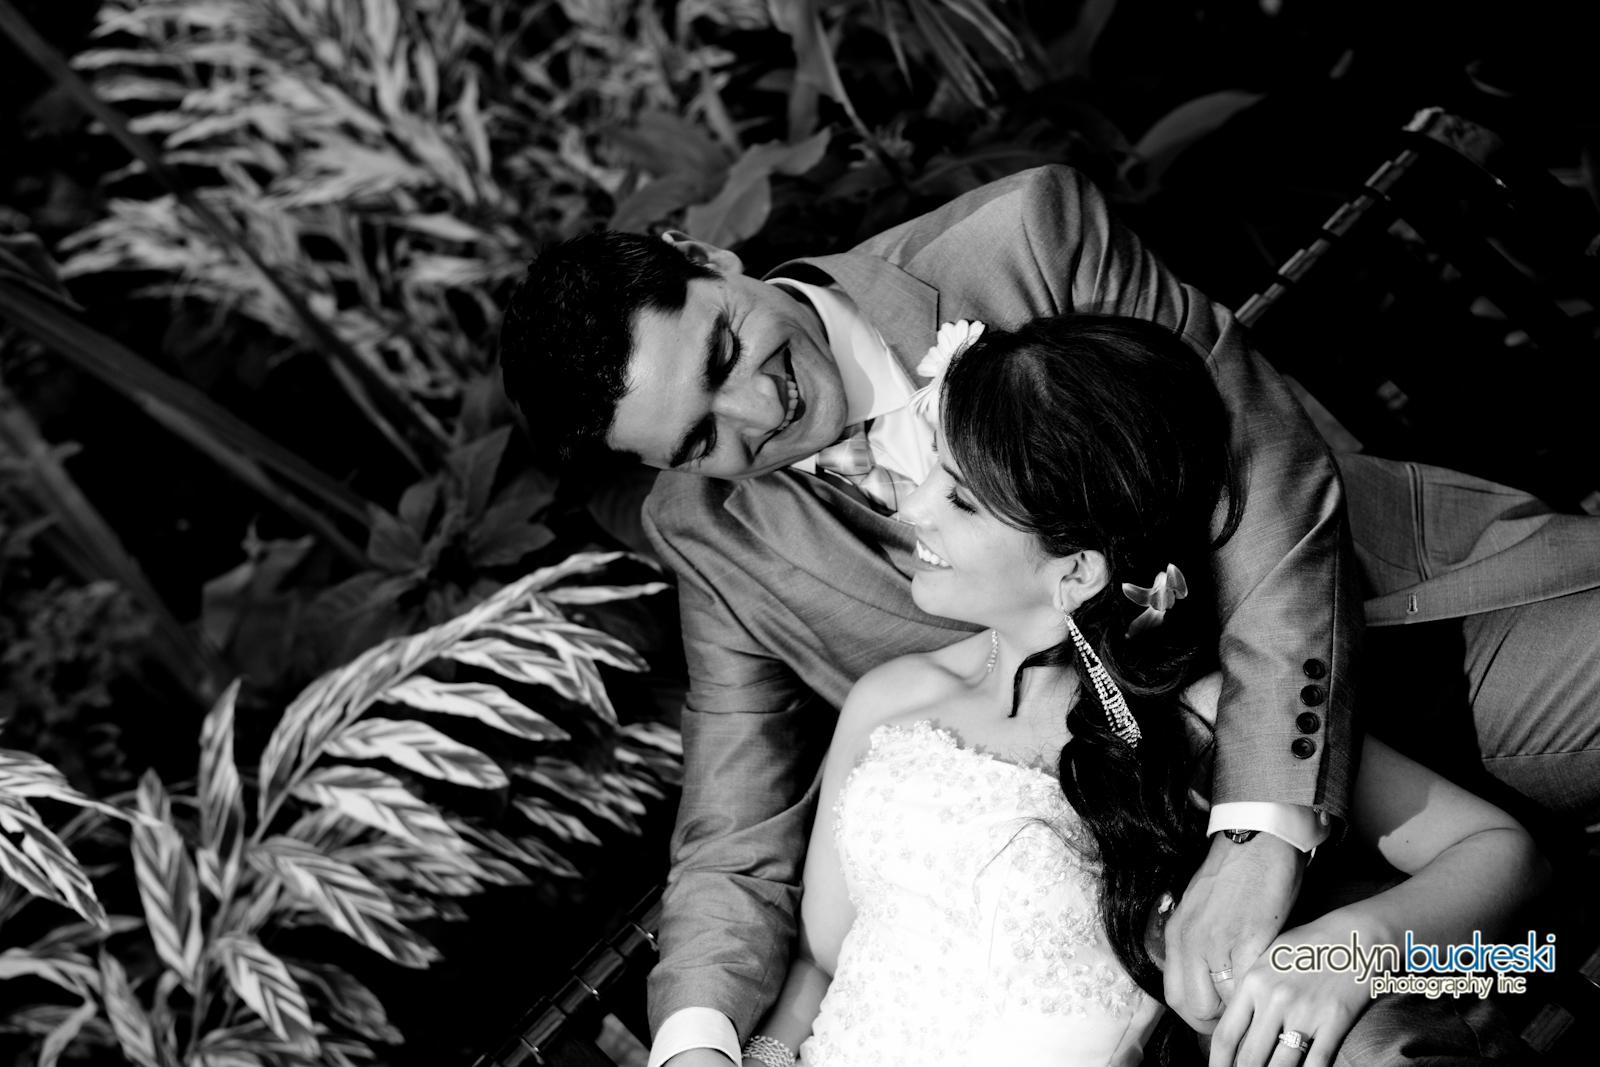 Wedding - Caroline-243.jpg